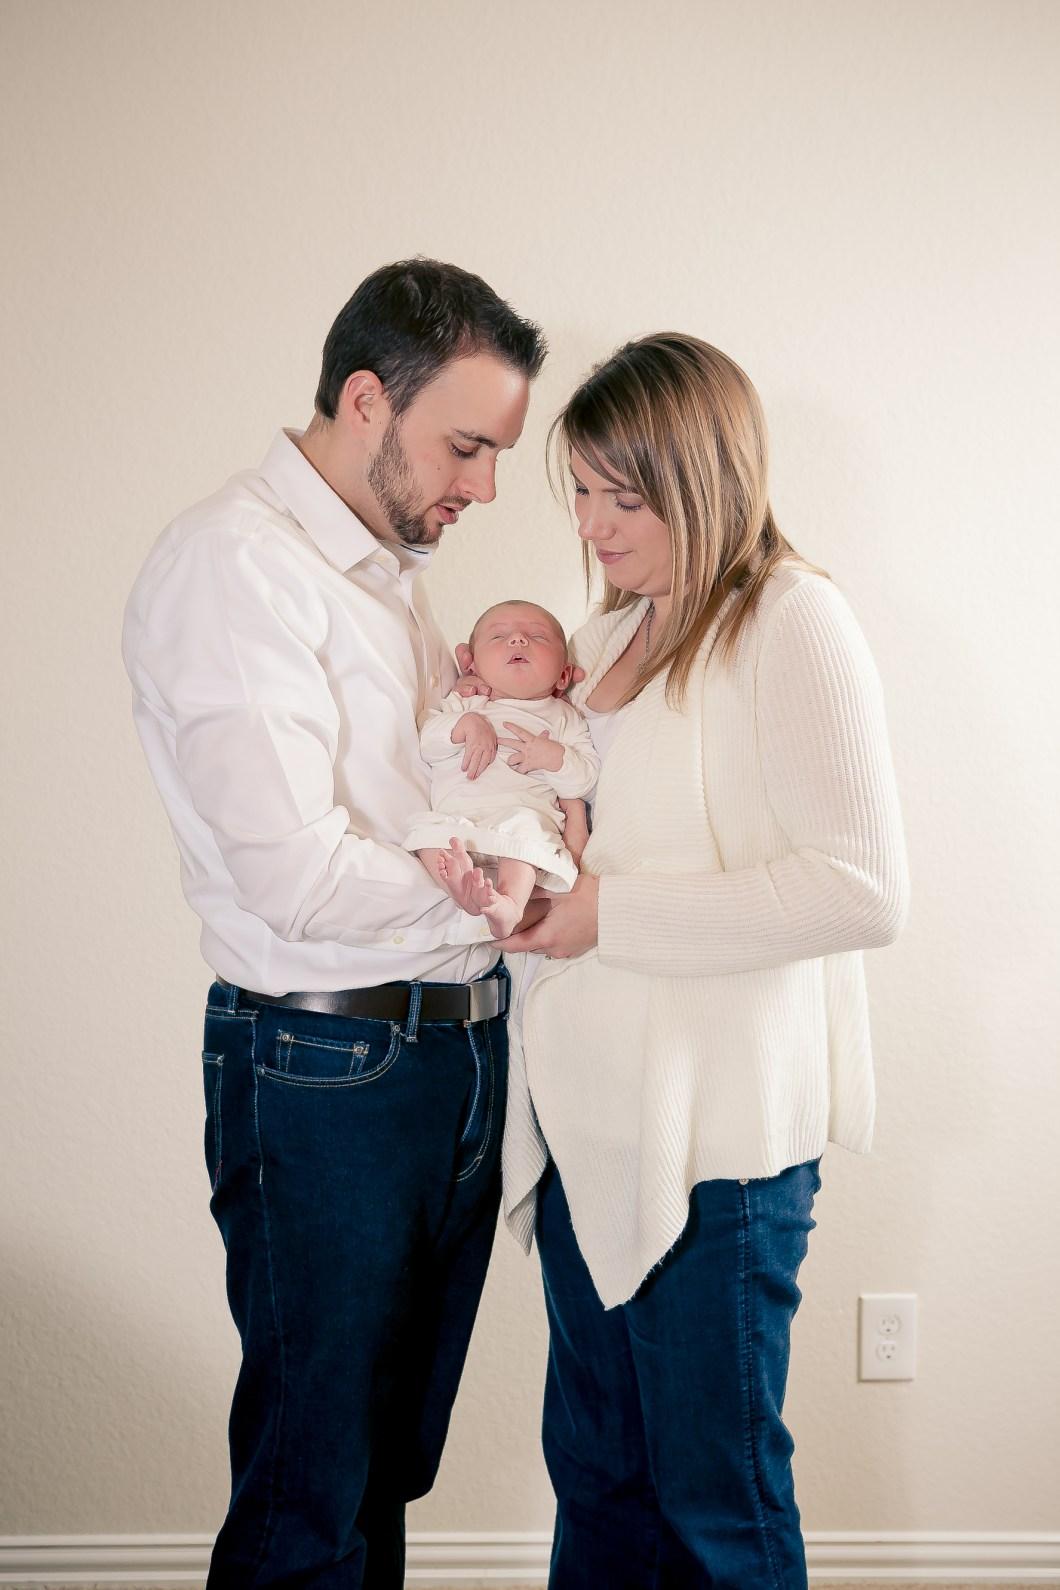 Atascocita family photographer